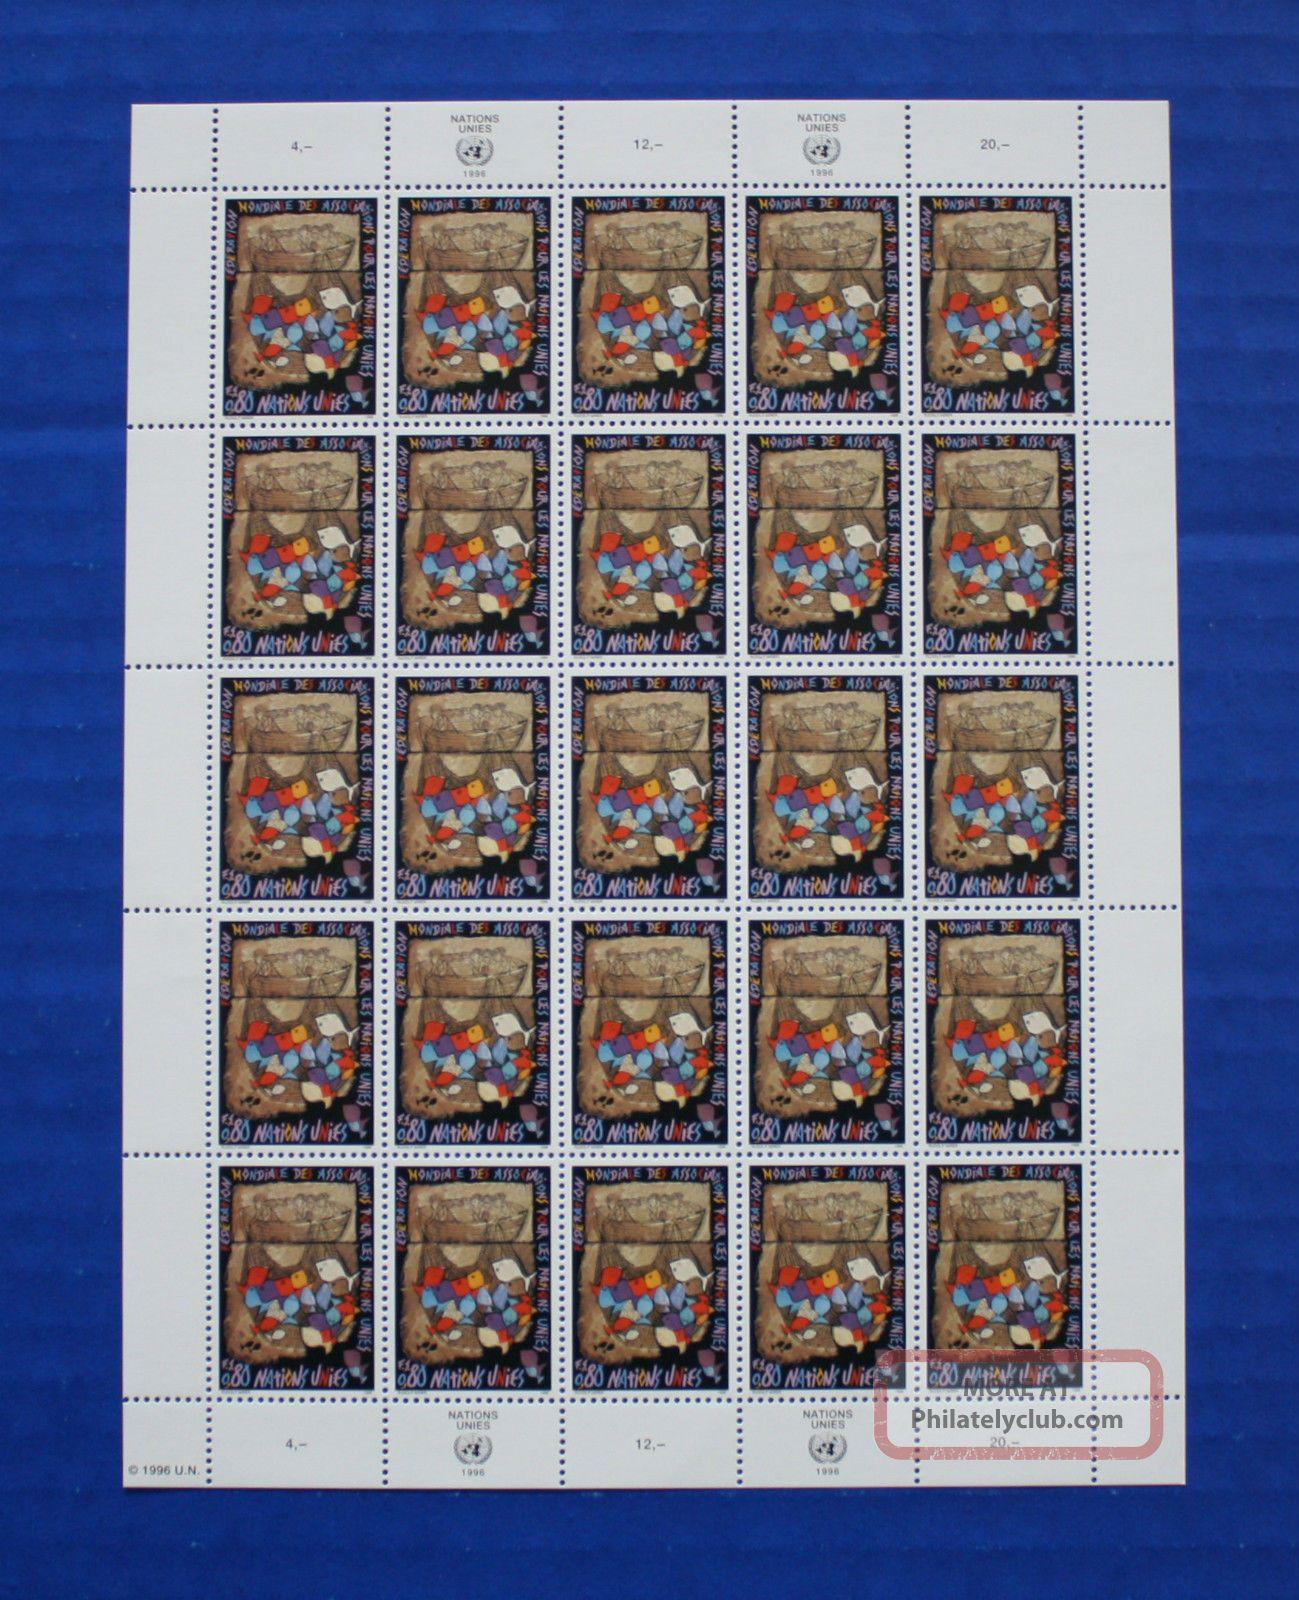 United Nations (g277) 1996 Wfuna 50th Anniversary Sheet Worldwide photo